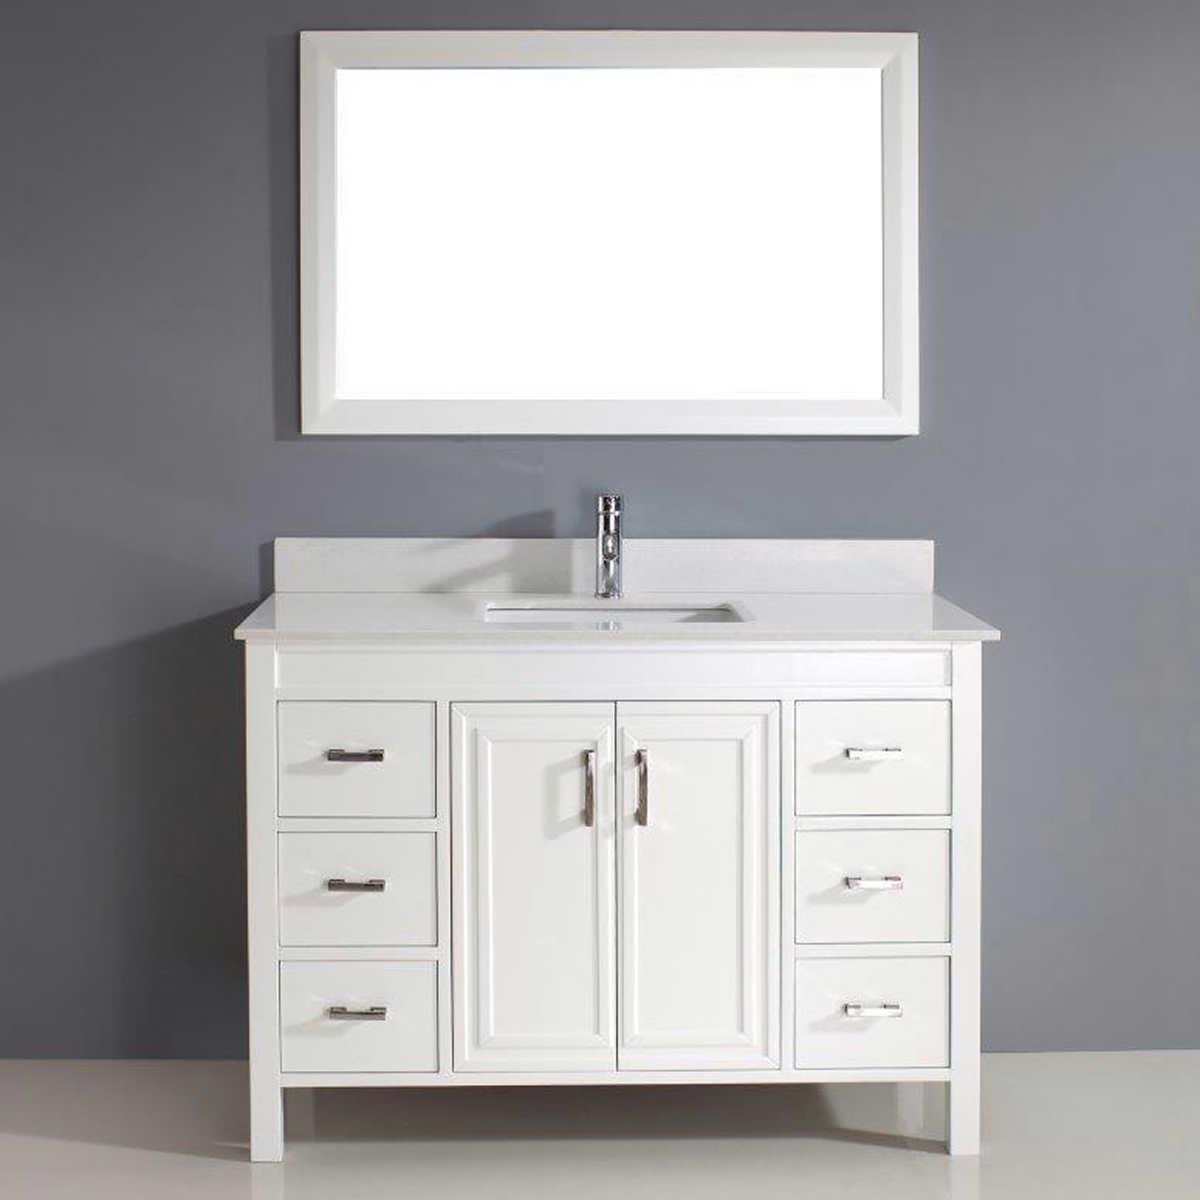 "Corniche 12"" White Vanity by Studio Bathe"